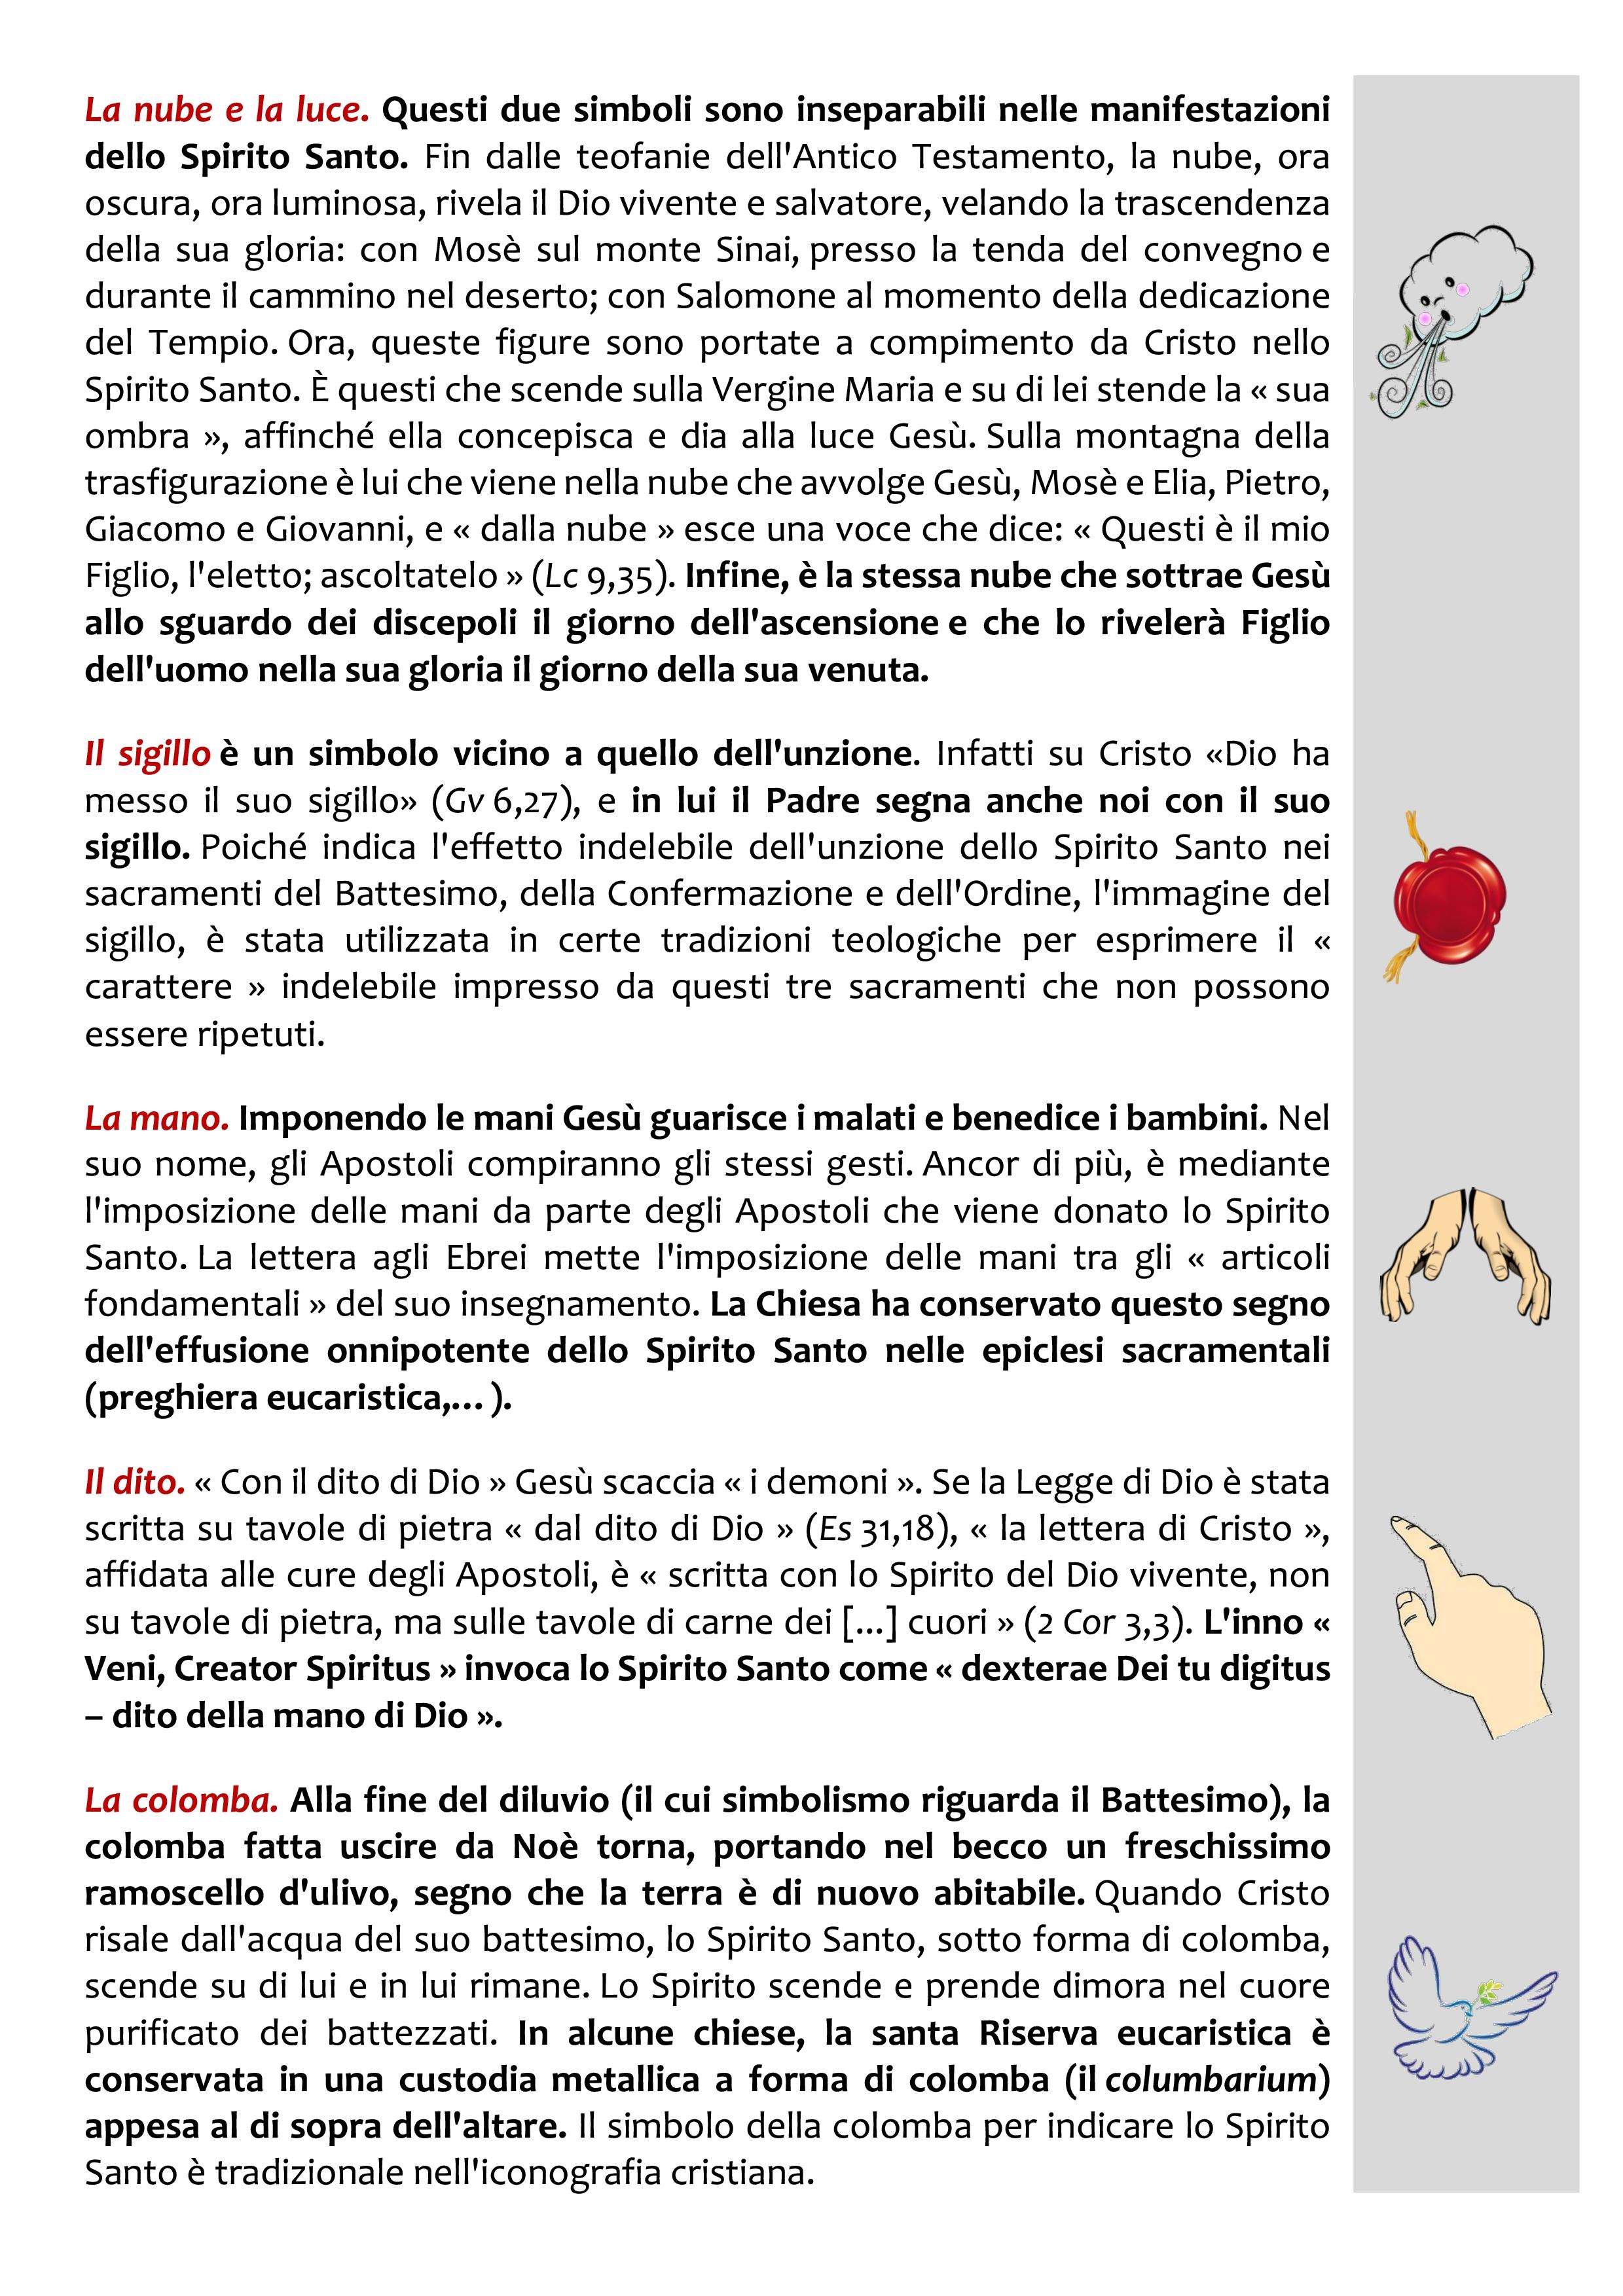 2020 - Coronavirus - Pentecoste_romano-004